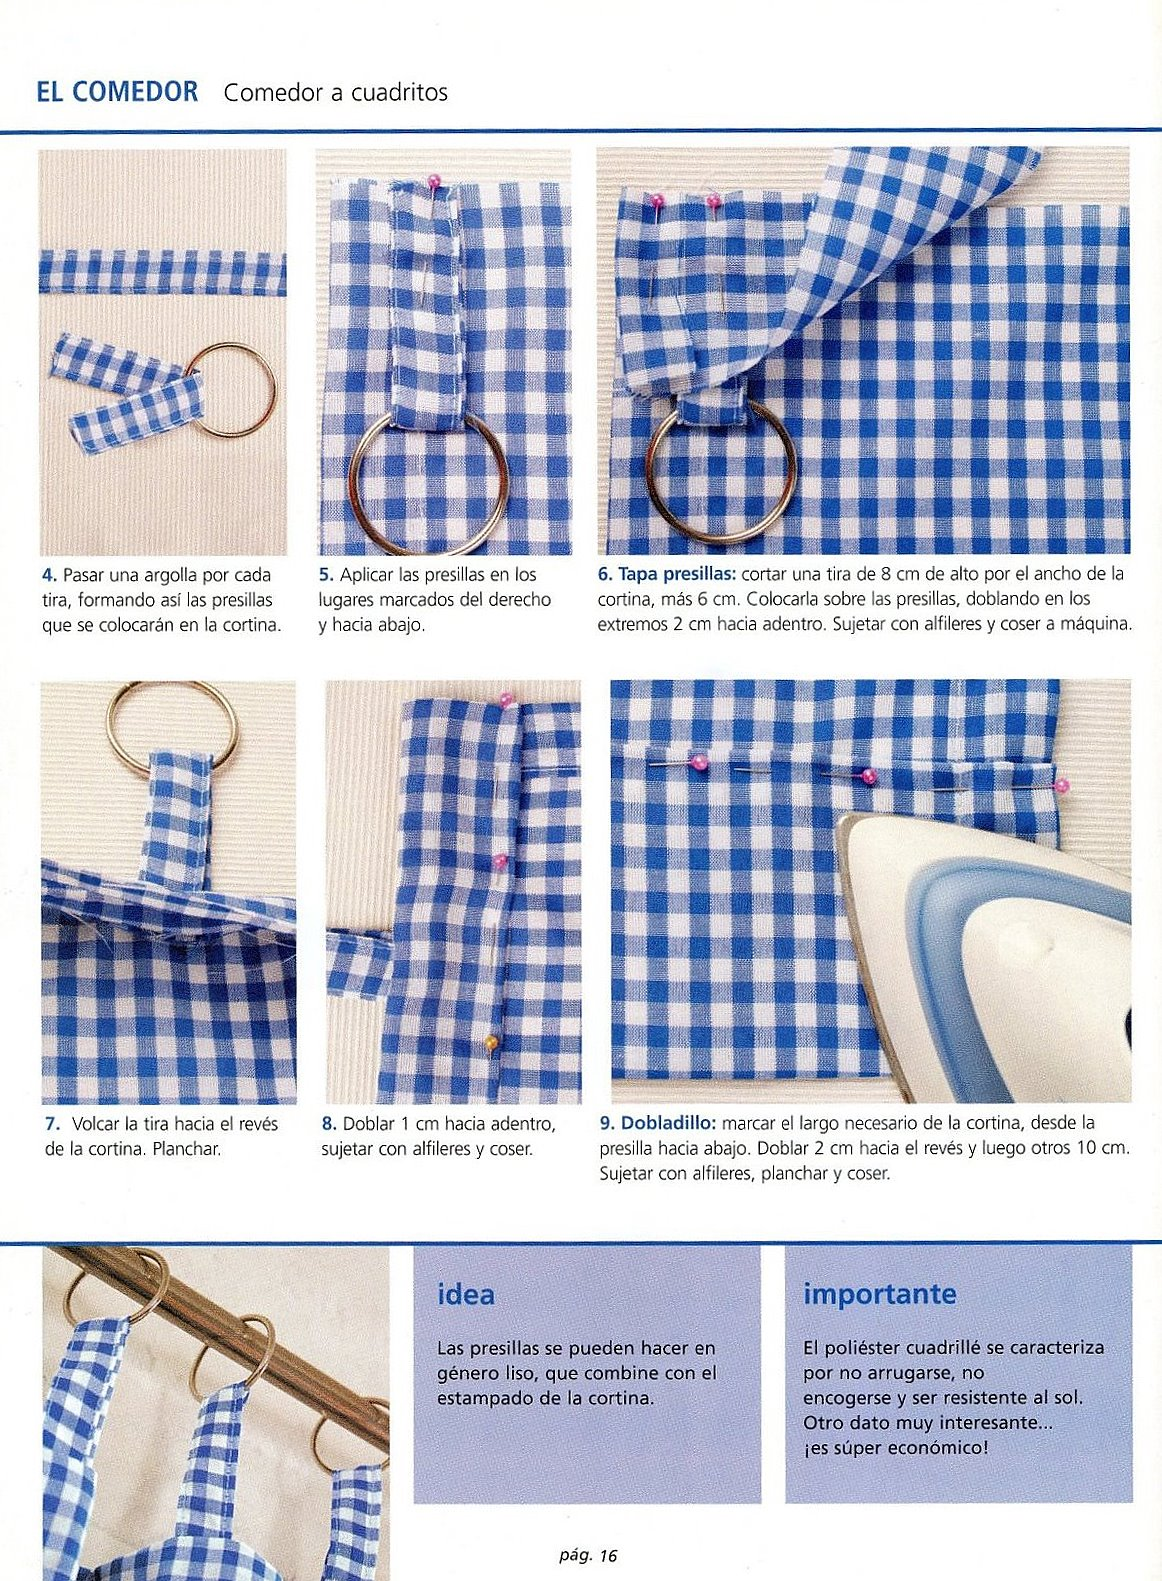 Pin manualidades para tu cocina pelautscom on pinterest for Cortinas de comedor